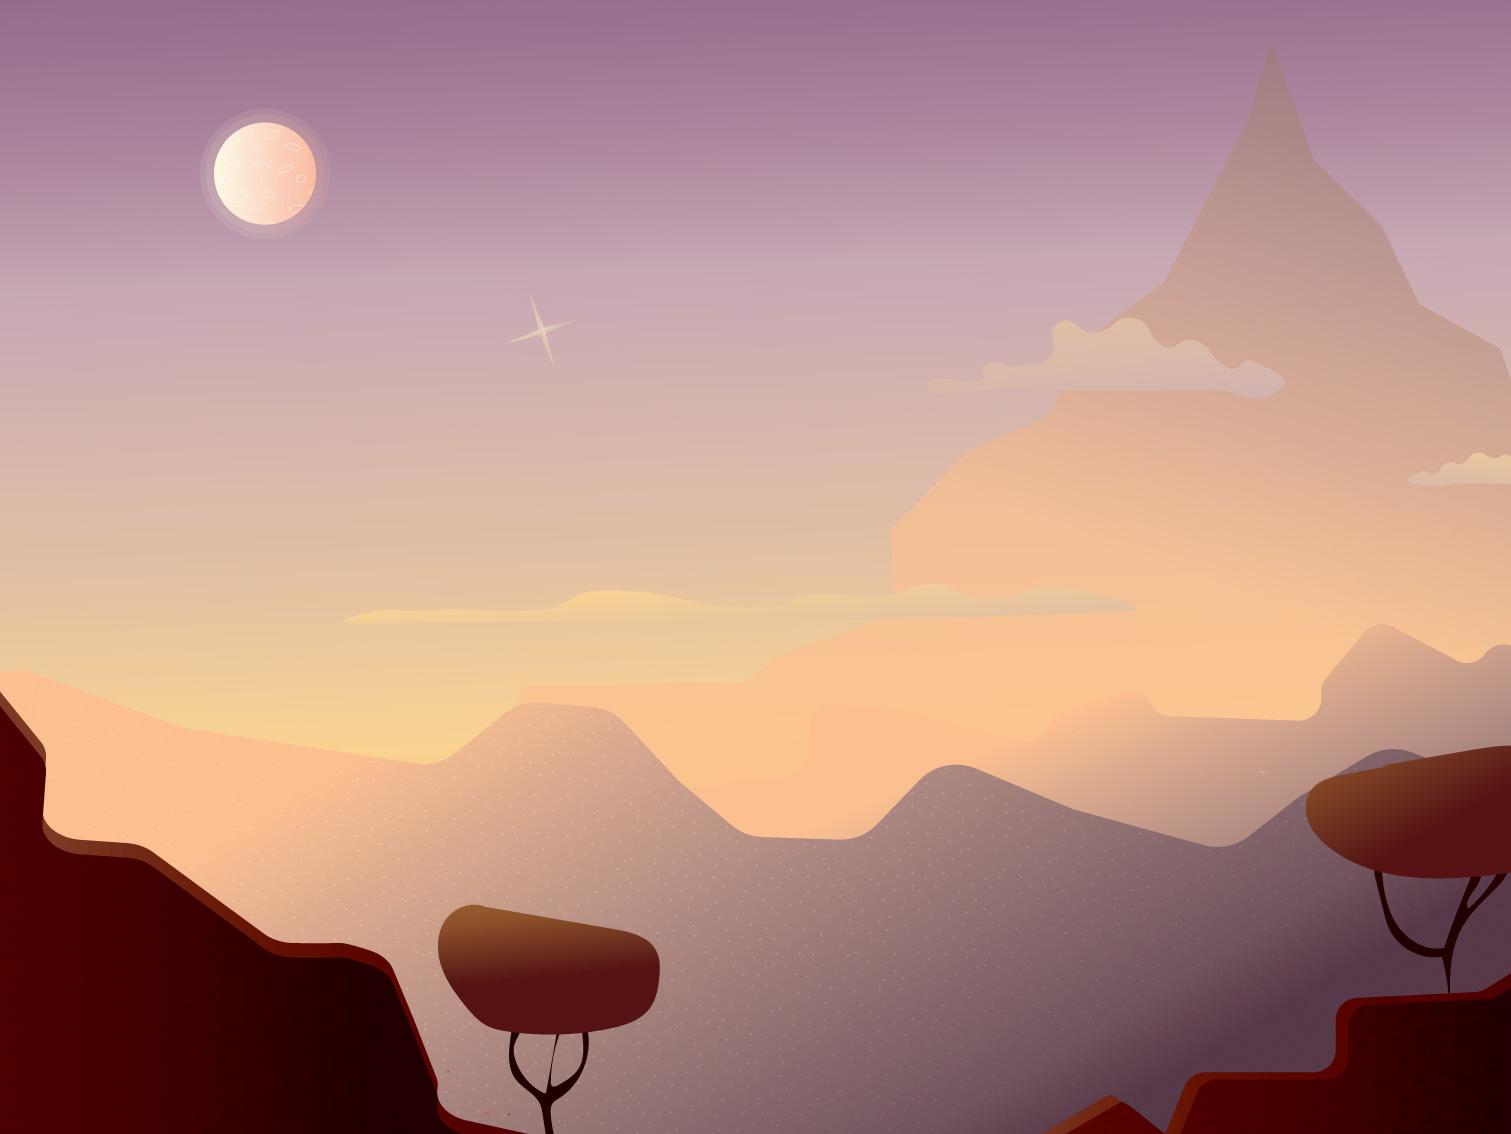 Due North texture graphic game art game concept warm colors earth tones vector 2d art landscape illustration